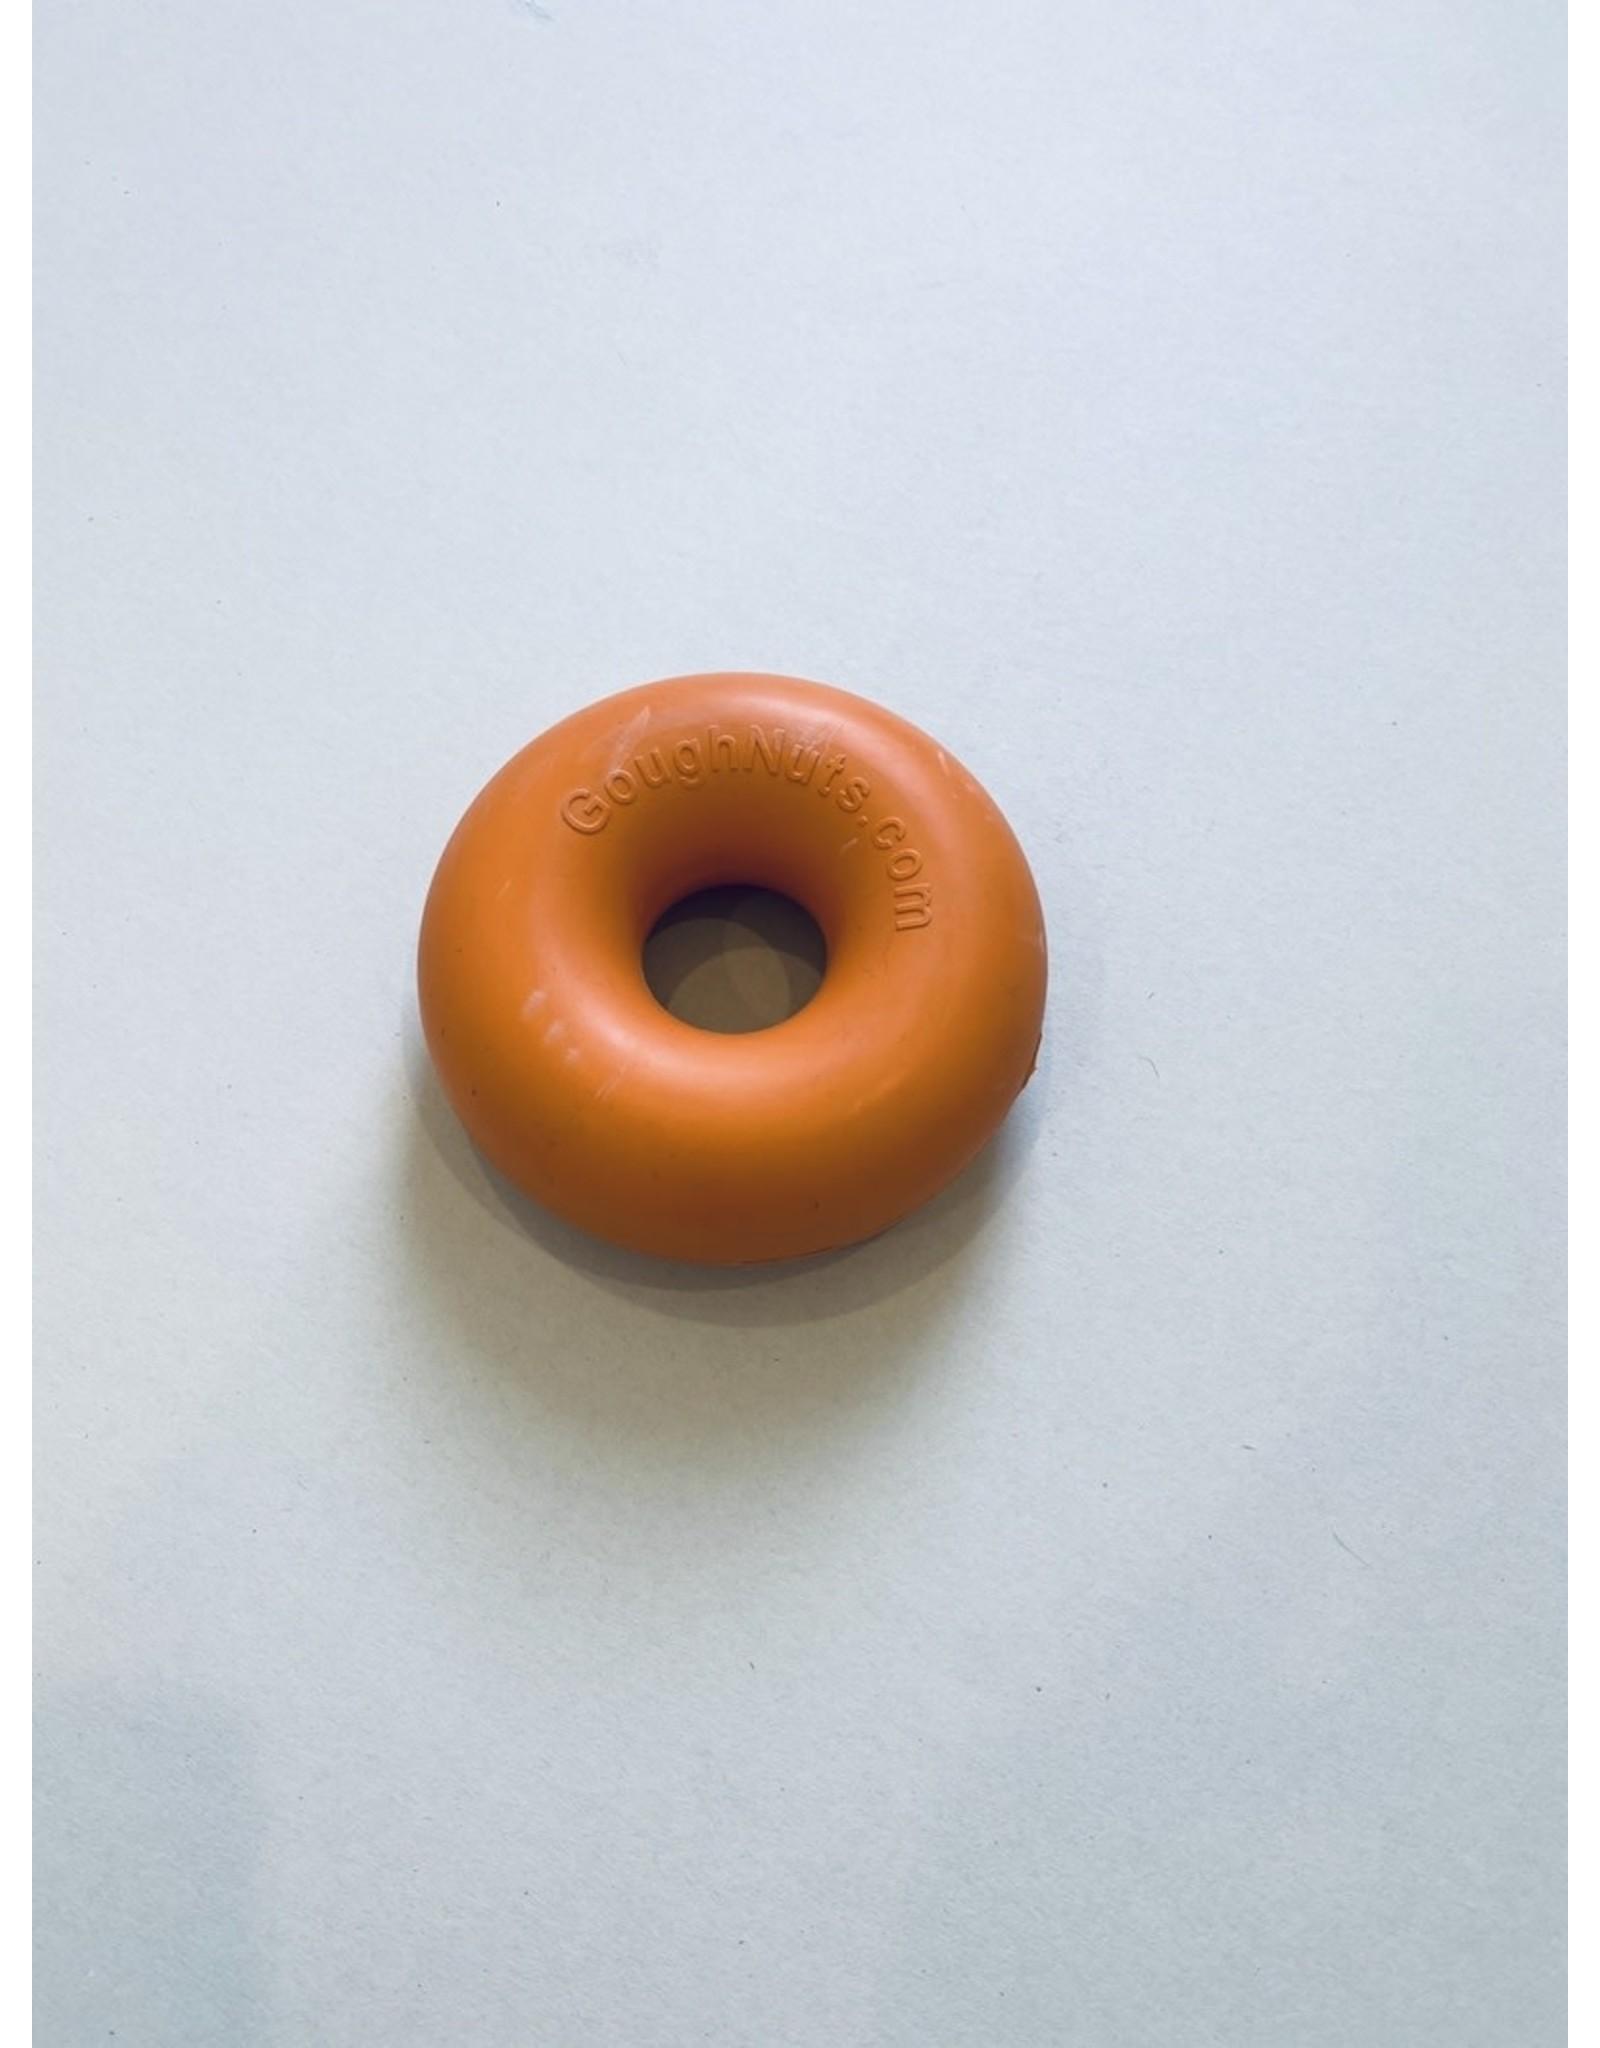 GoughNuts GoughNuts ORANGE Original 0.75 Ring